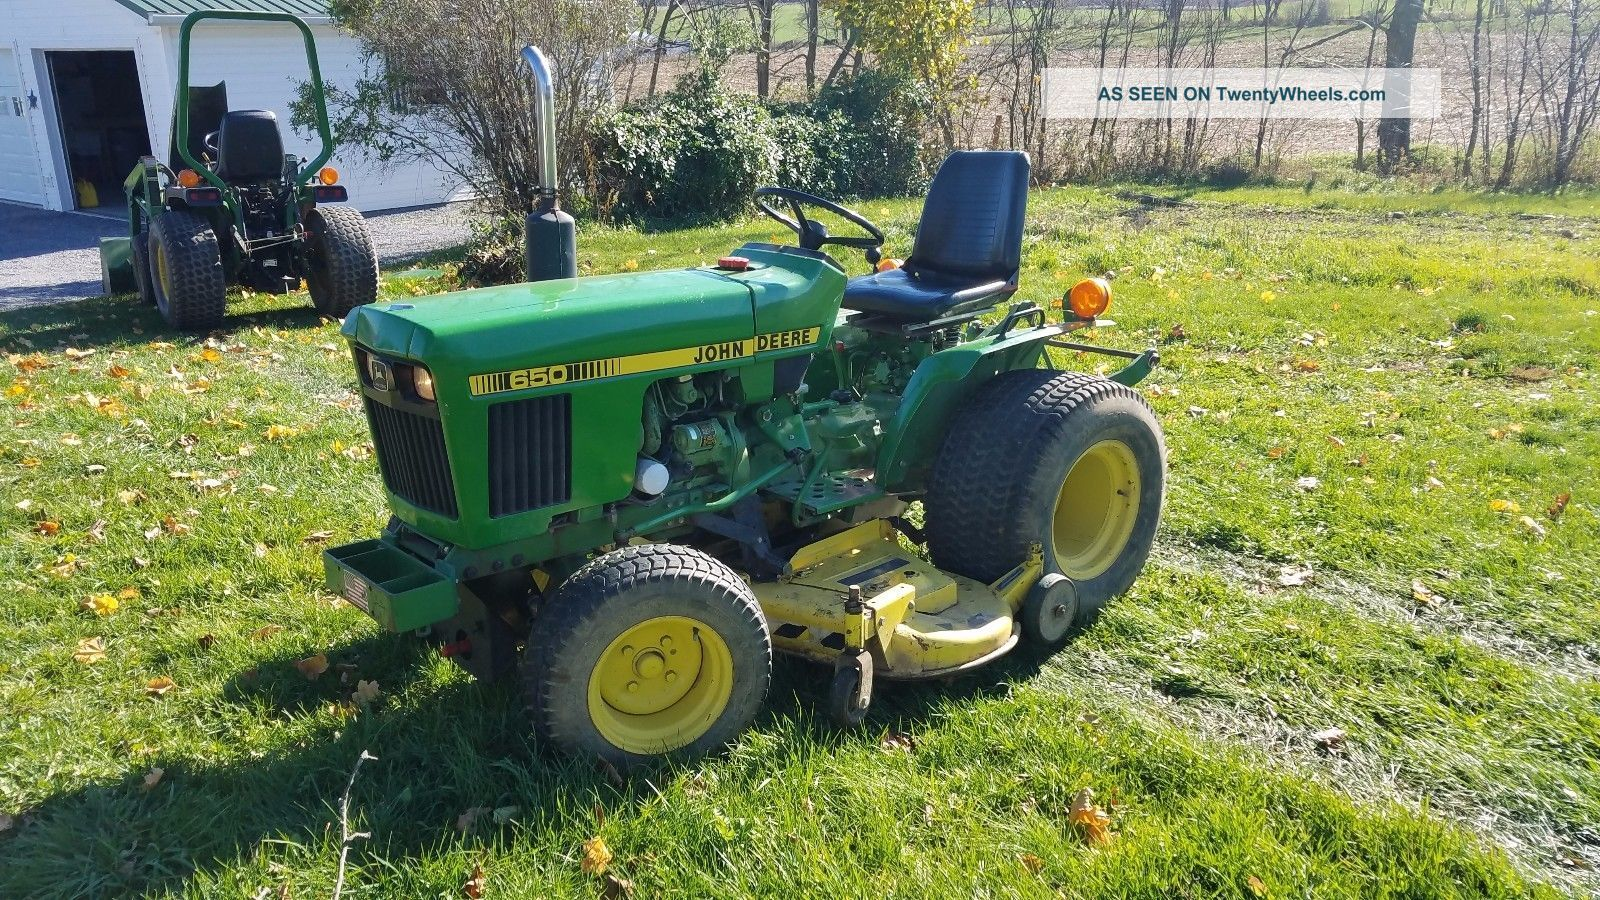 1984 John Deere 650 Garden Tractor Lawn Mower Diesel 16hp ...